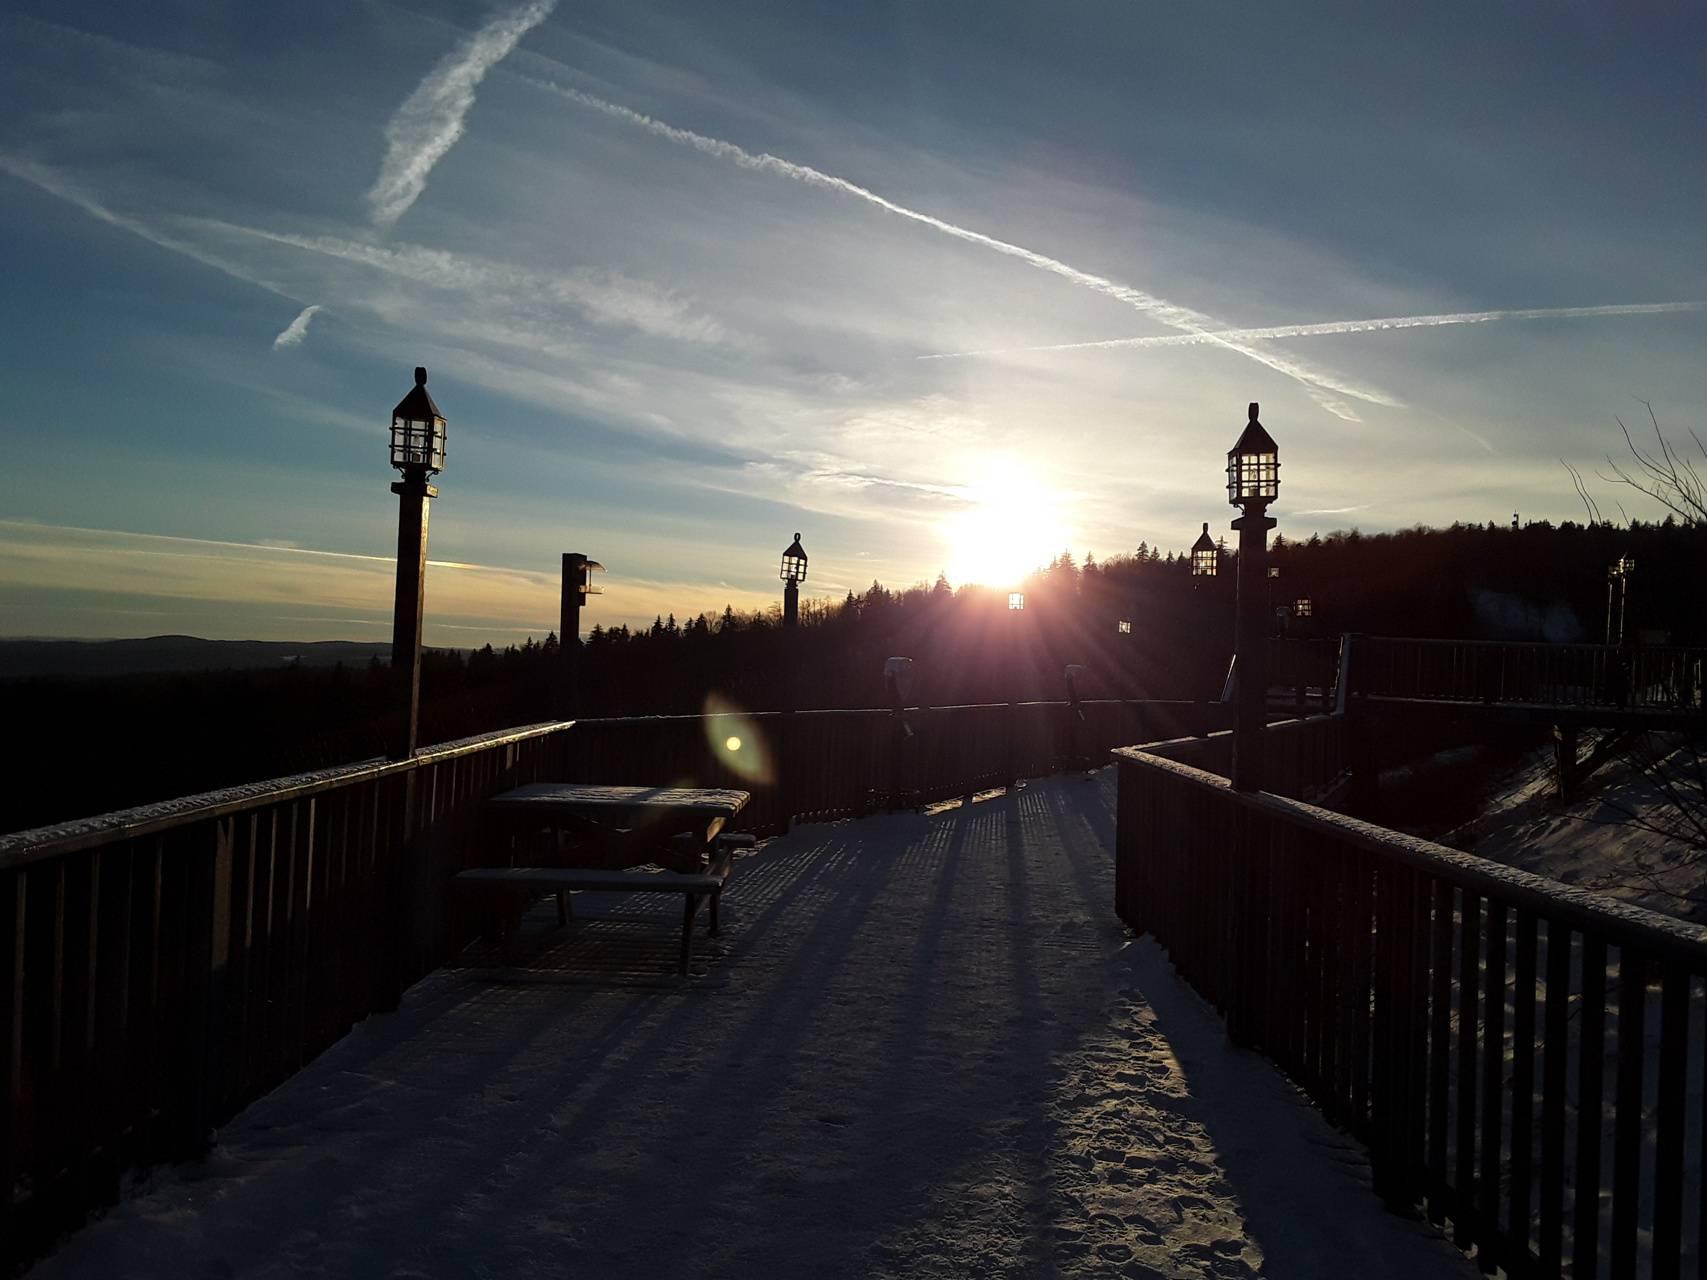 Winter in VT